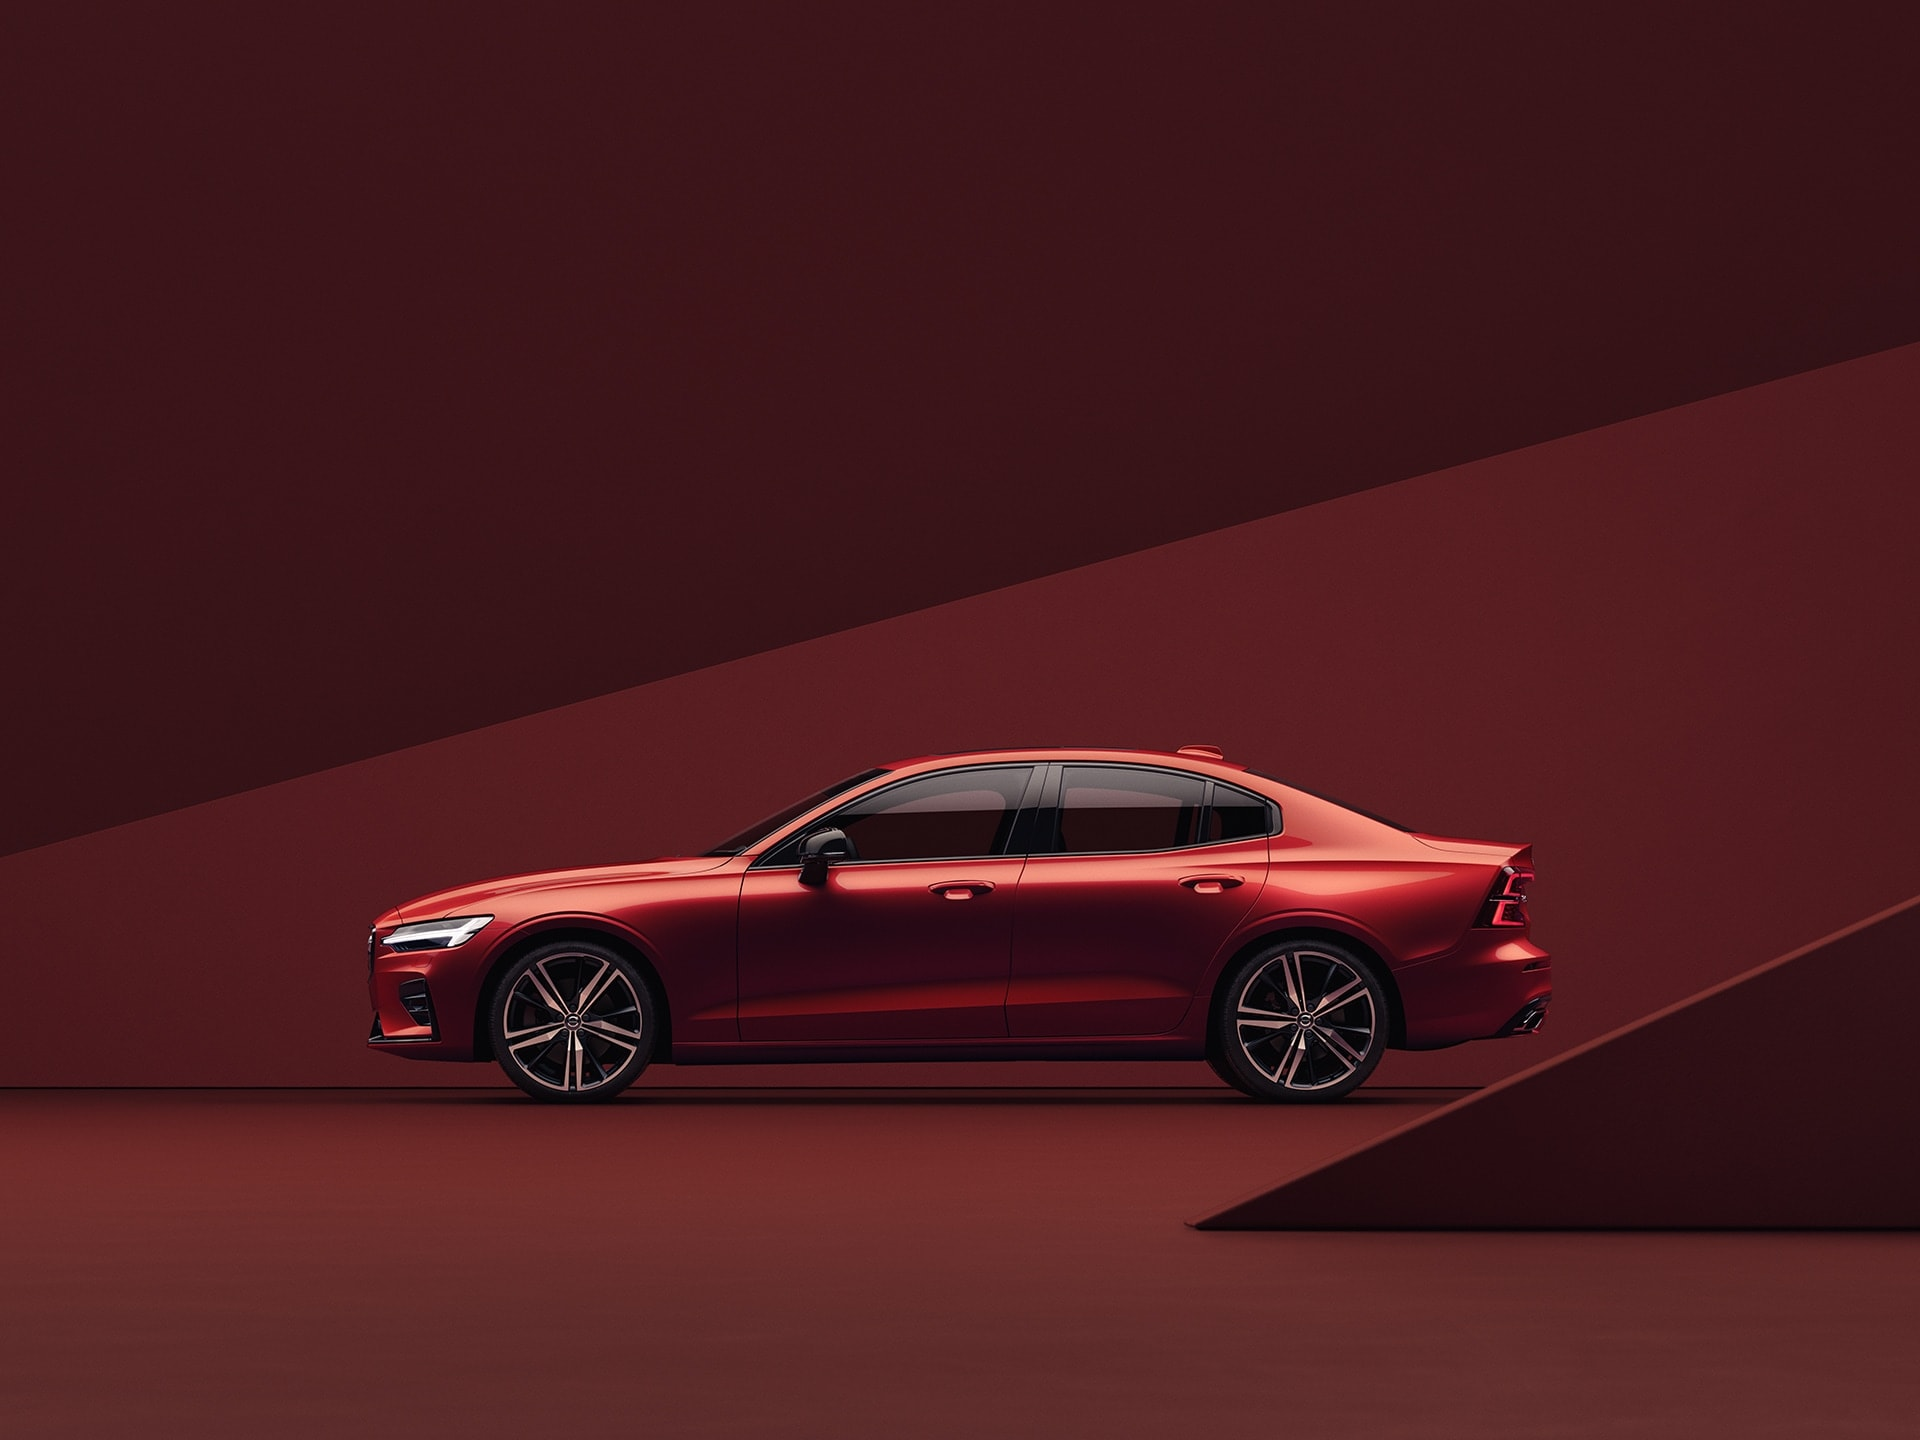 Piros Volvo S60 piros környezetben parkol.